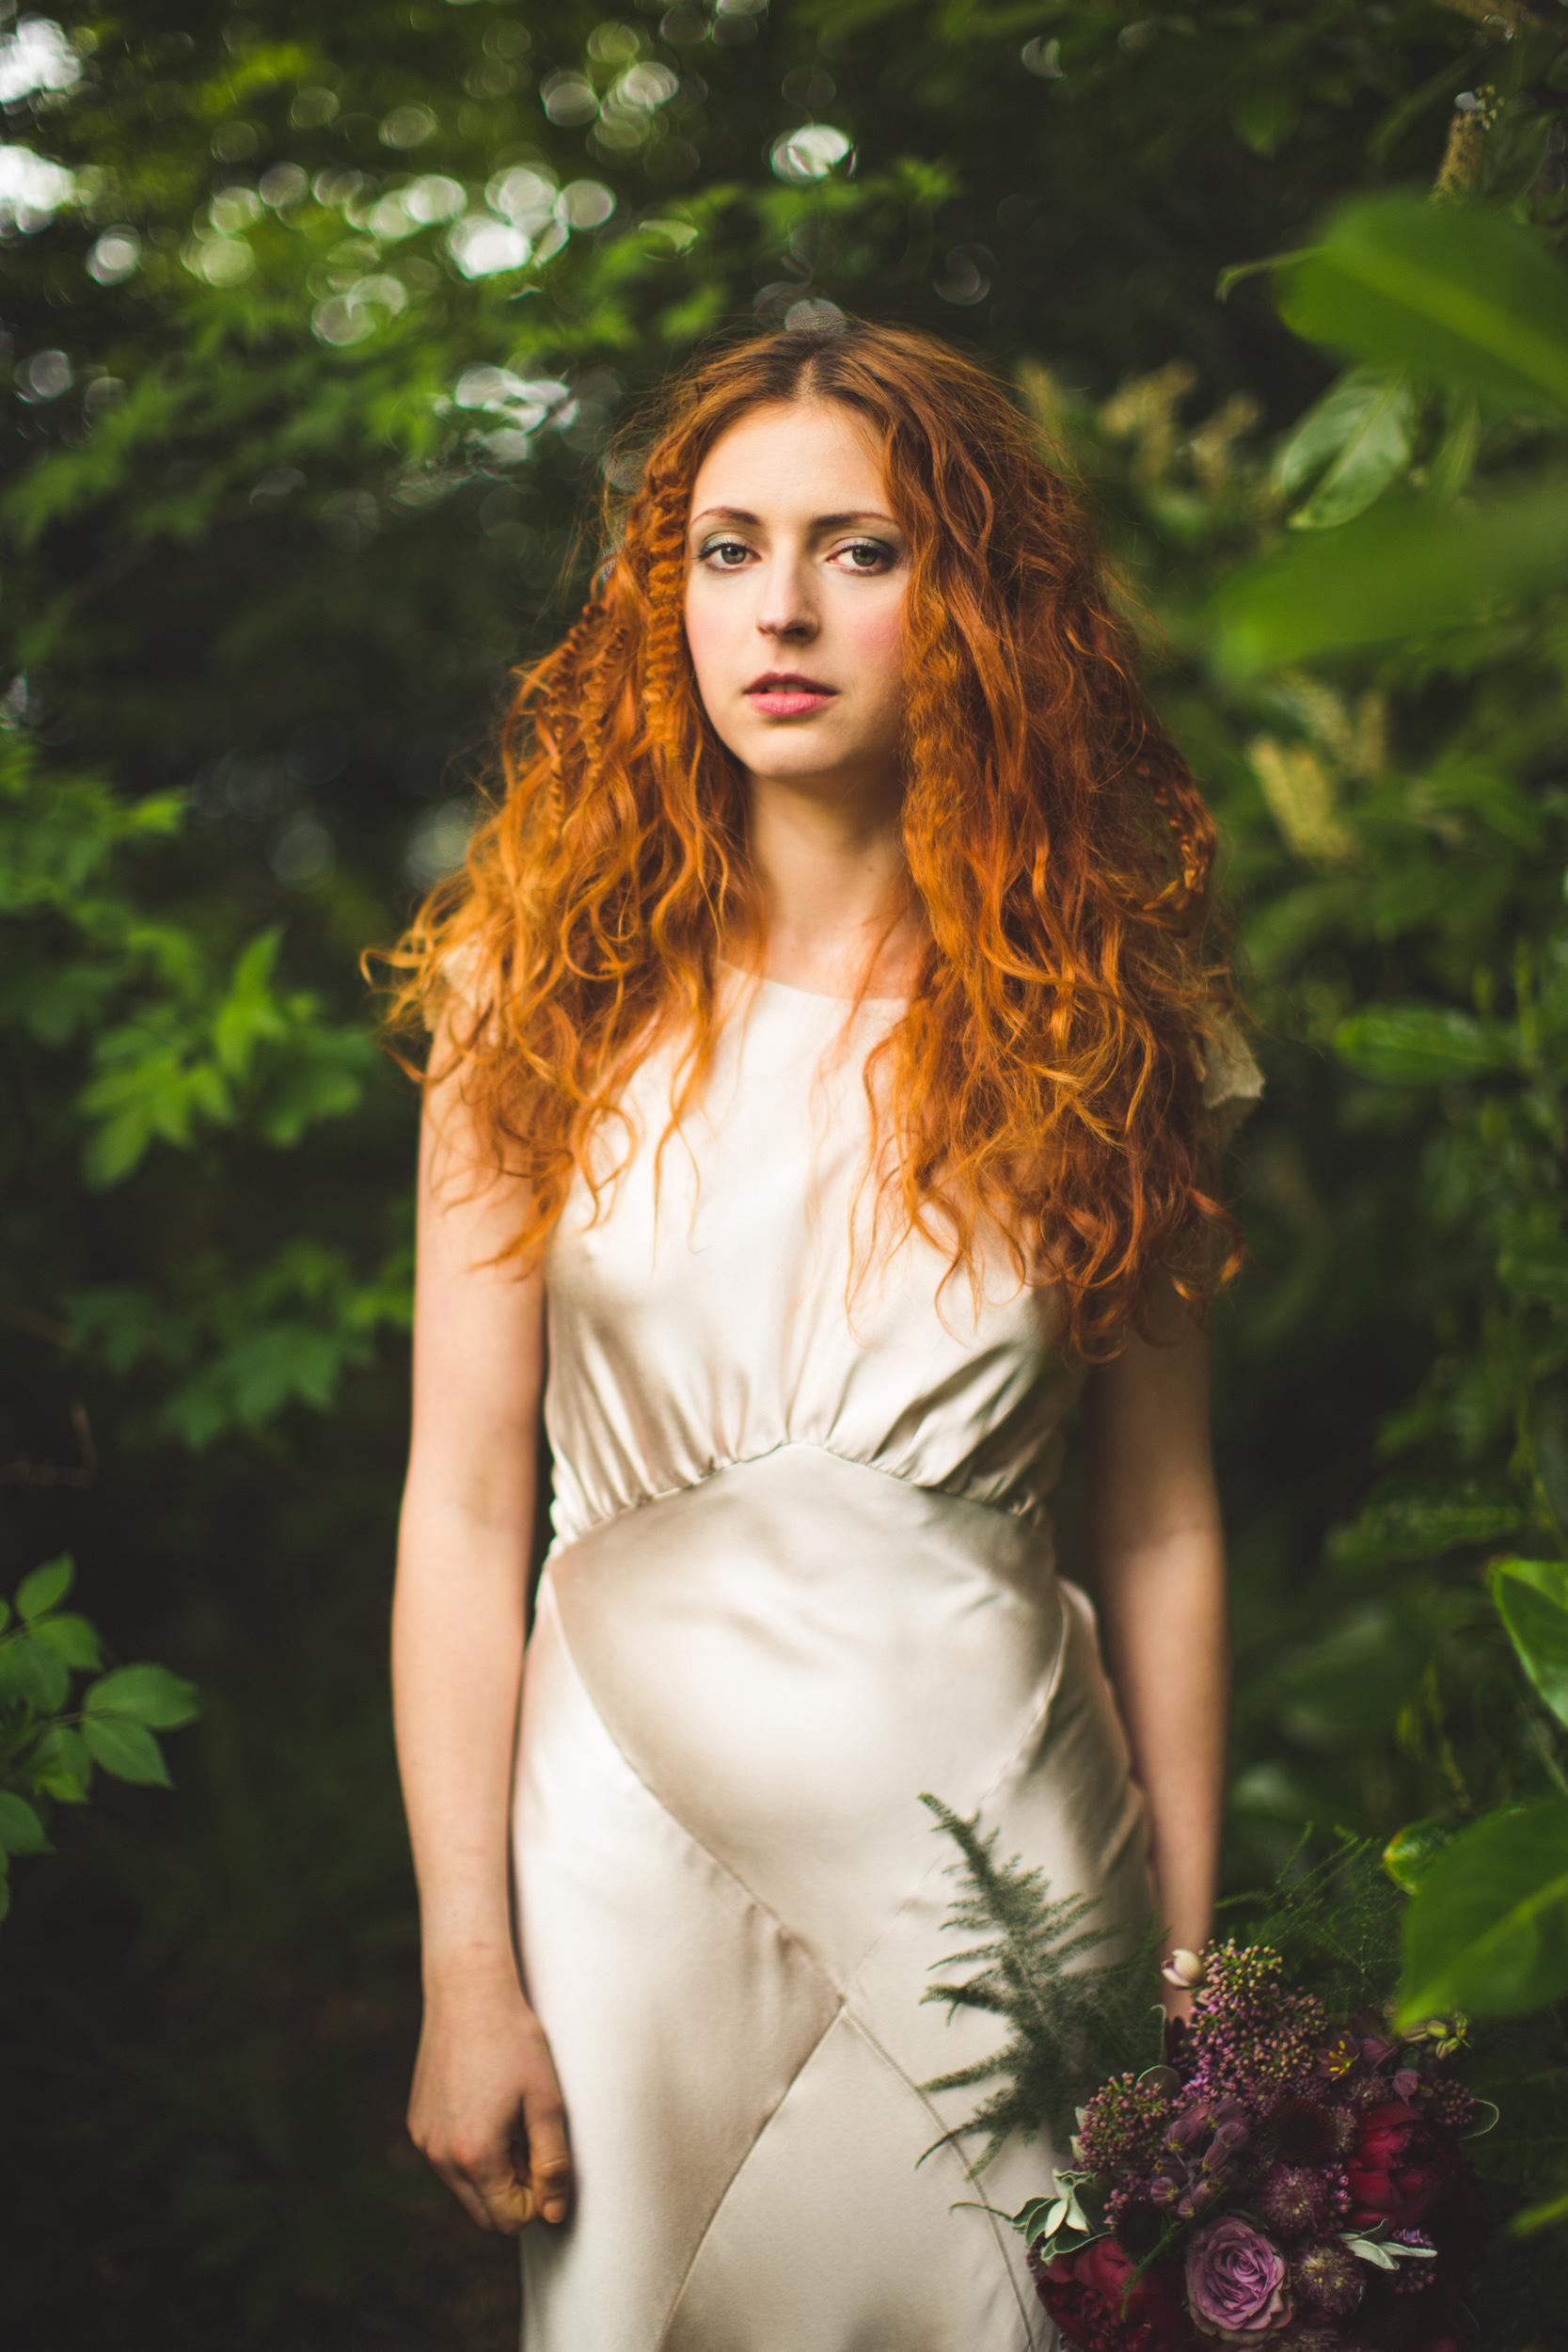 kate-beaumont-vintage-inspired-bridal-wedding-dresses-Sheffield-S6-27.jpg